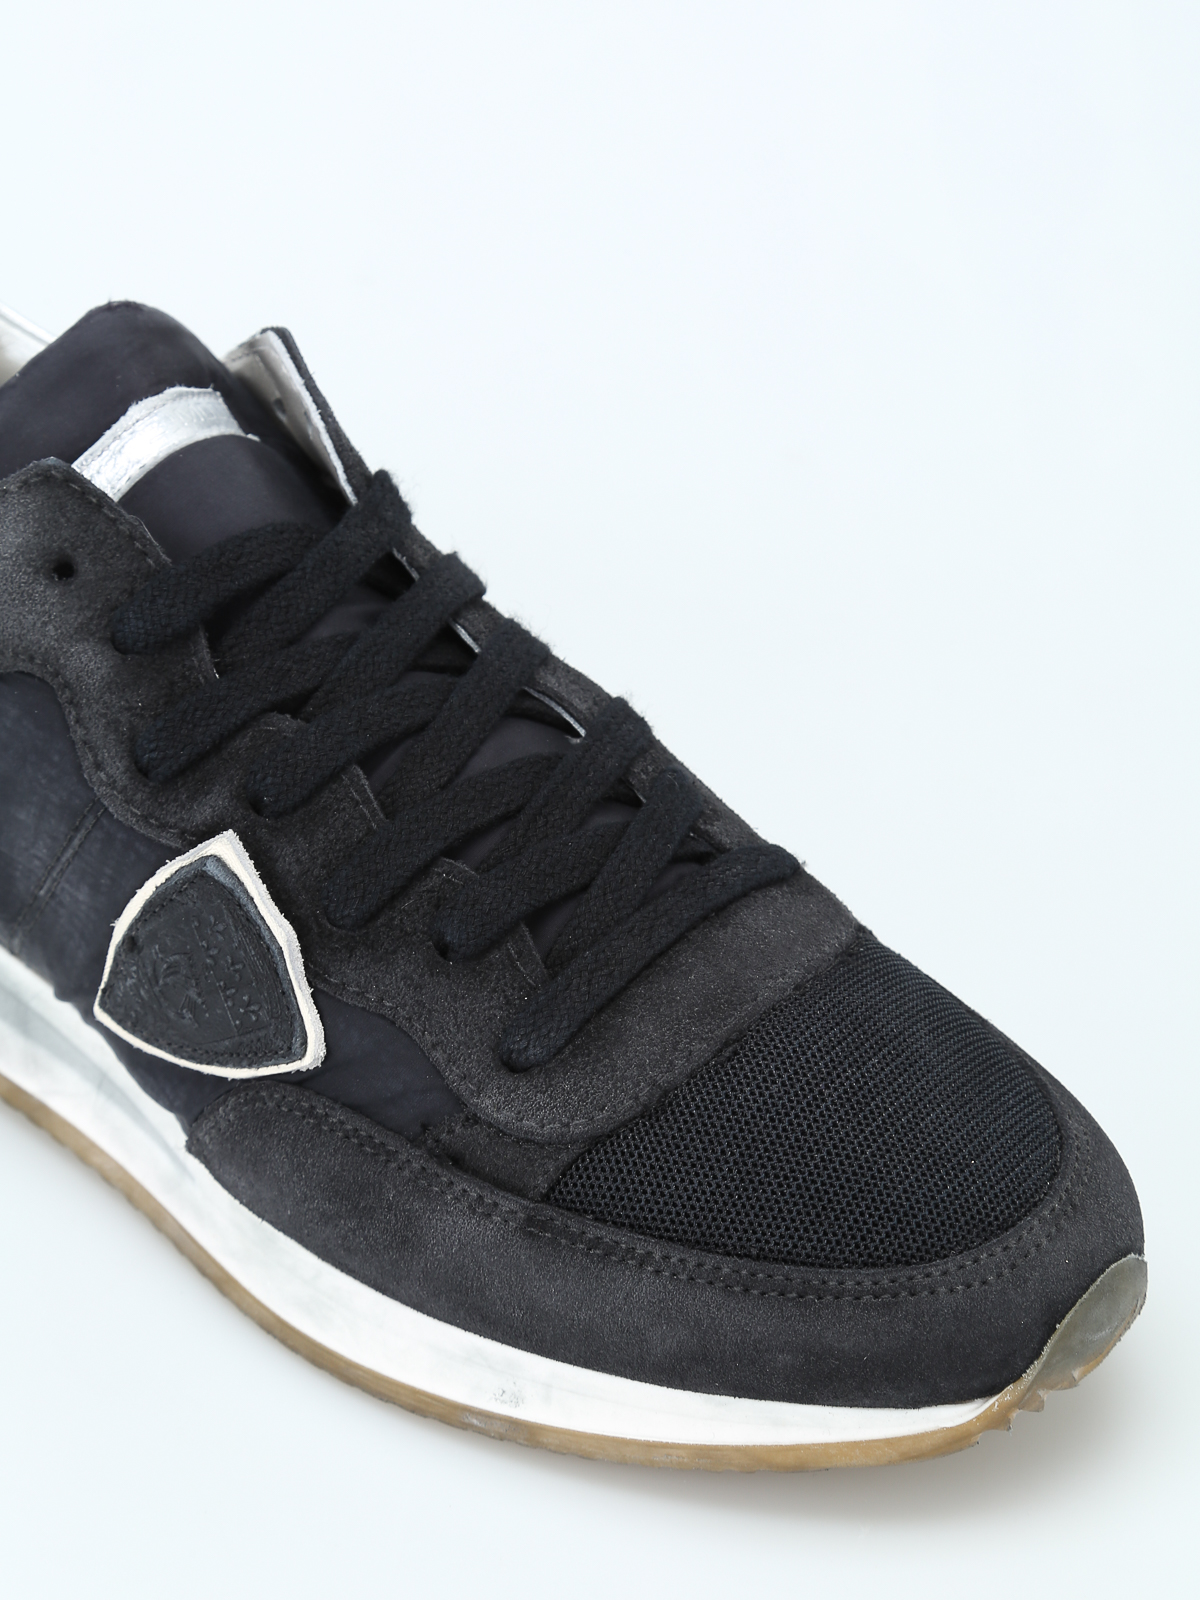 sito affidabile 18380 5bbff Philippe Model - Sneaker basse nere Tropez - sneakers - TRLD ...